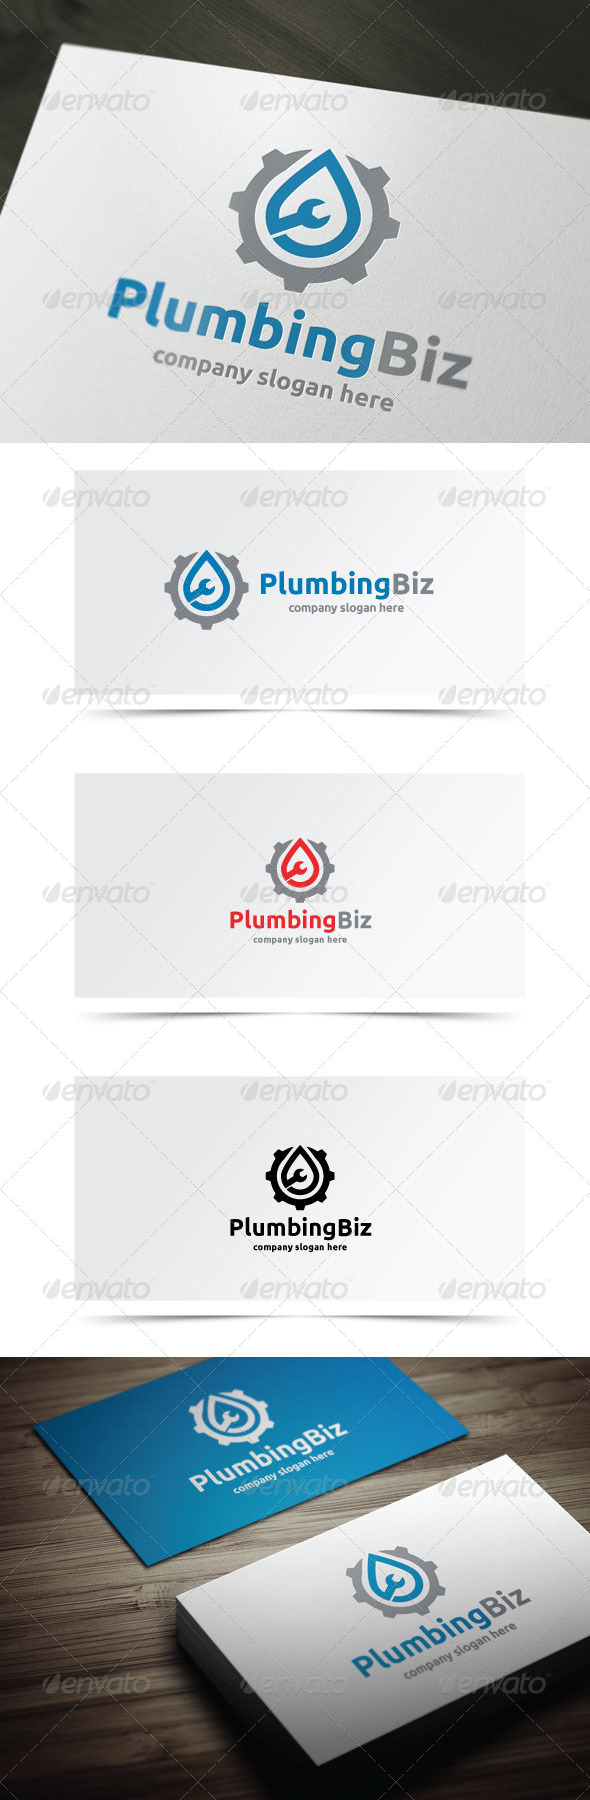 GraphicRiver Plumbing Biz 7868881